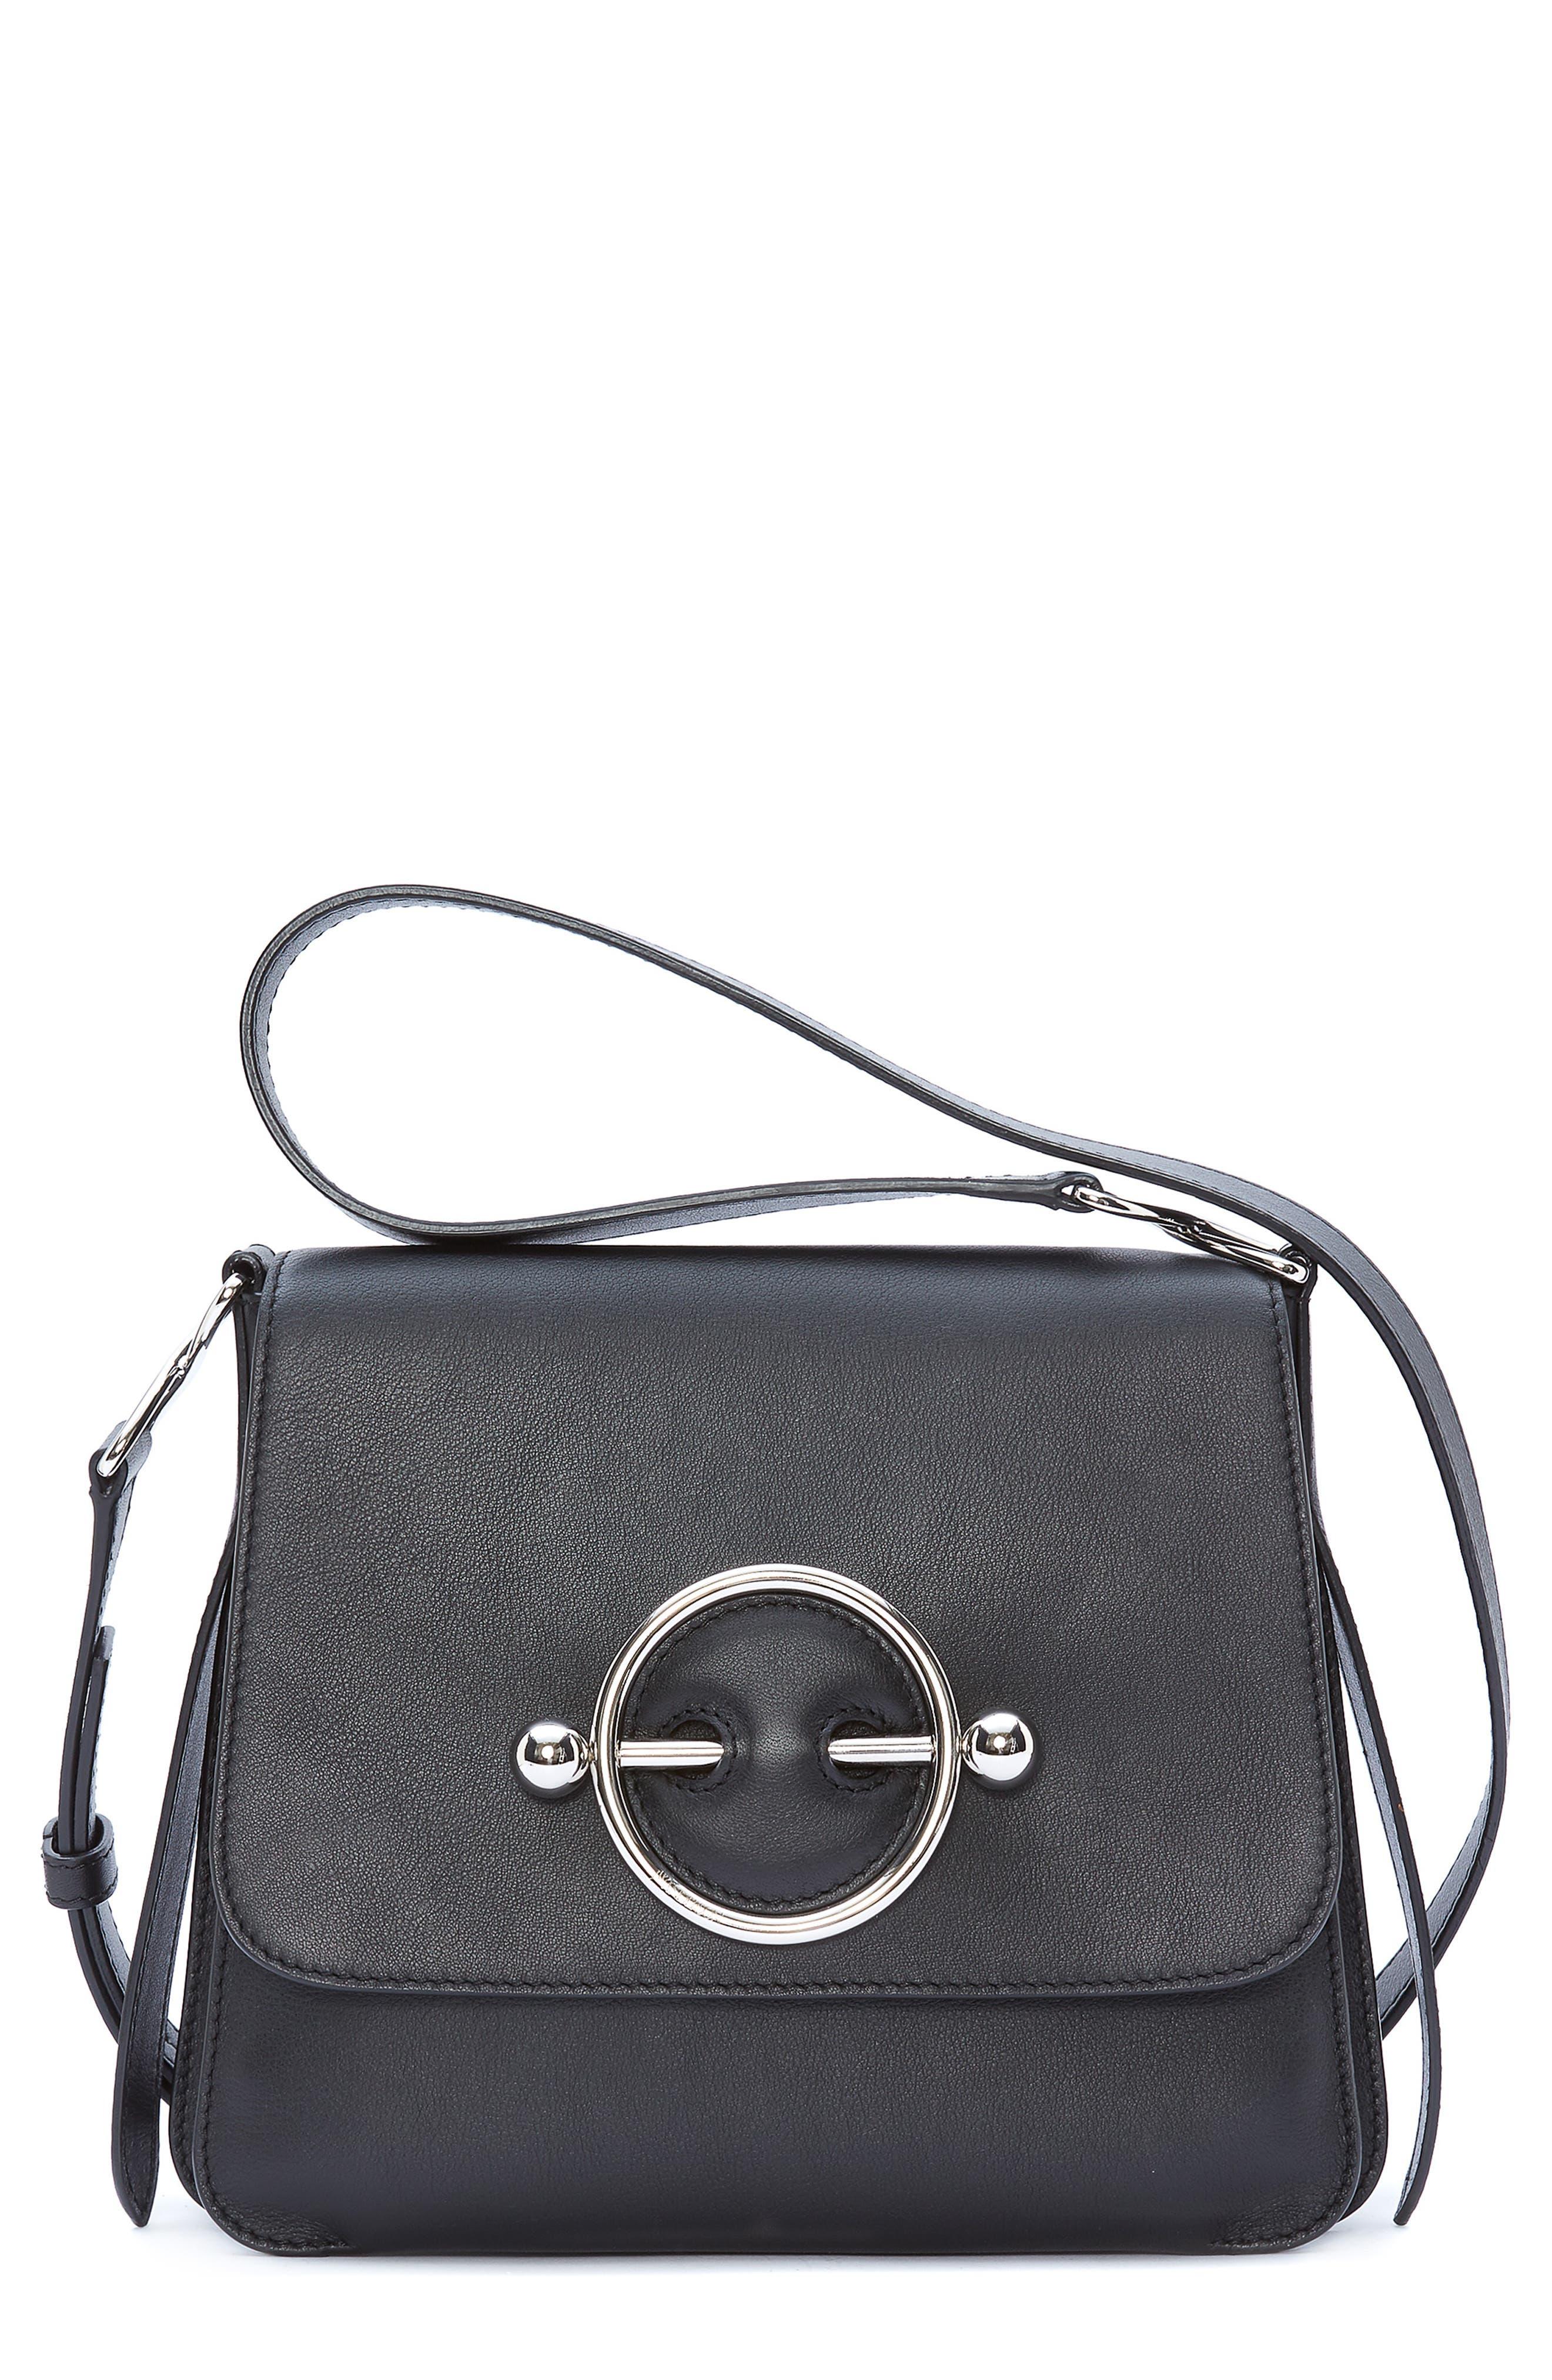 JW ANDERSON Disc Crossbody Bag, Main, color, BLACK